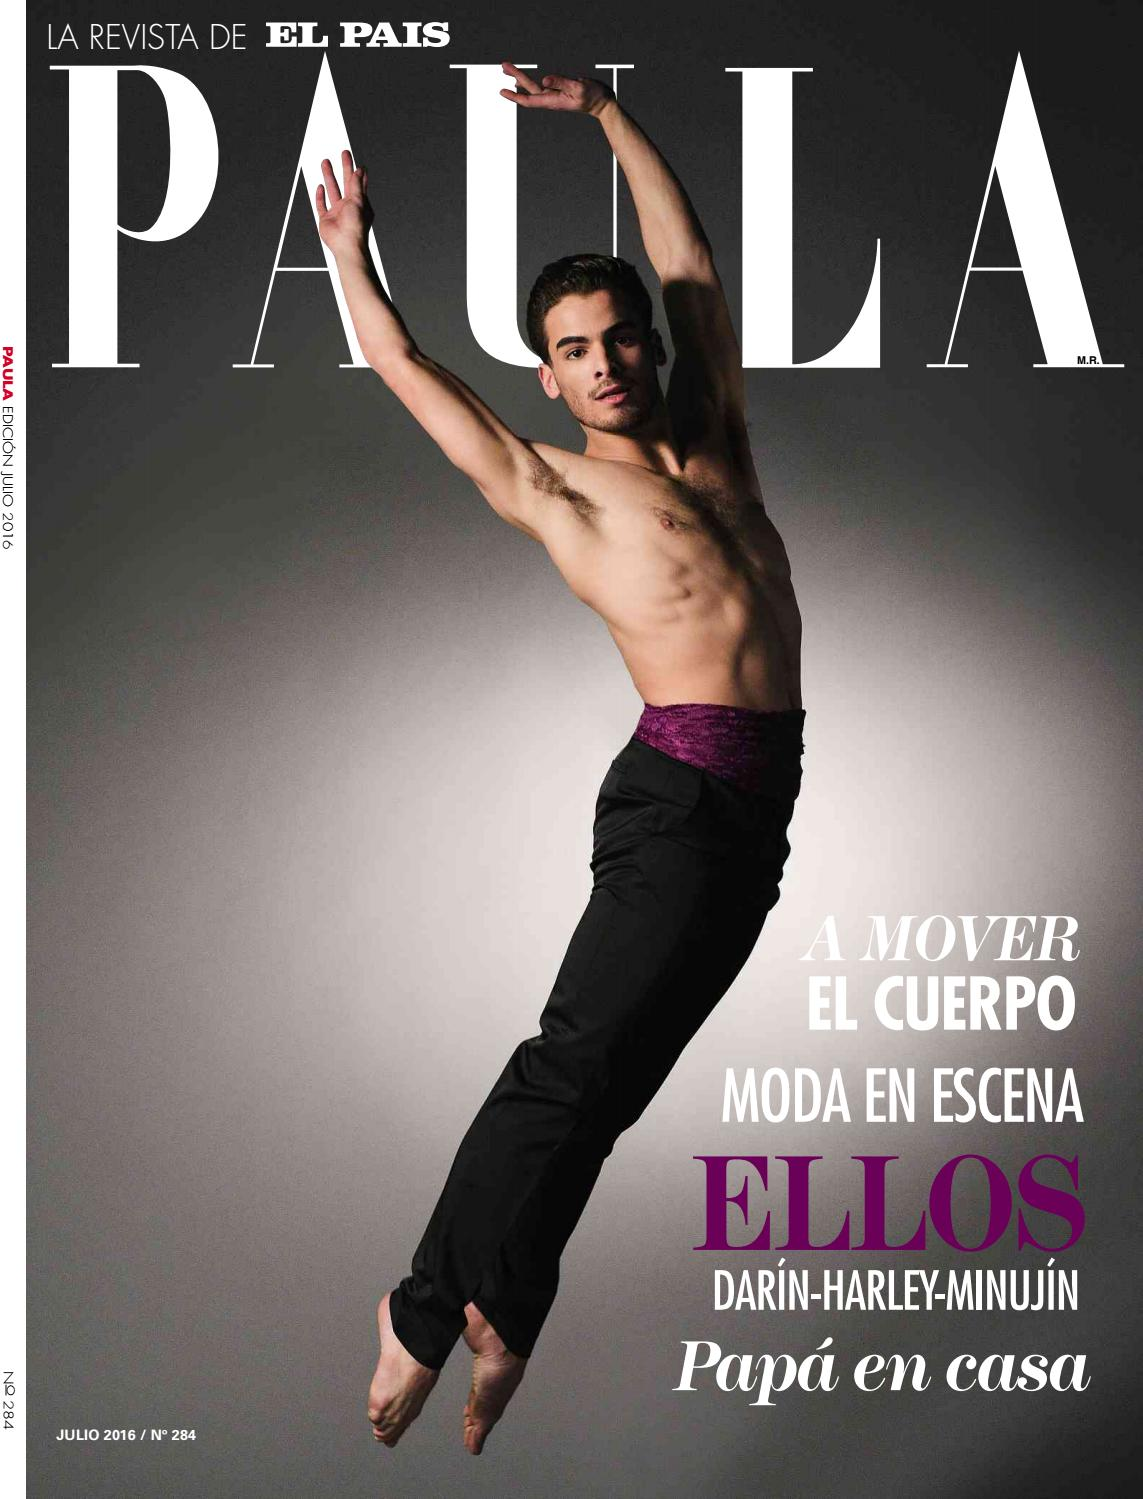 Paula julio 2016 by Revista Paula - issuu 78cbb802b98